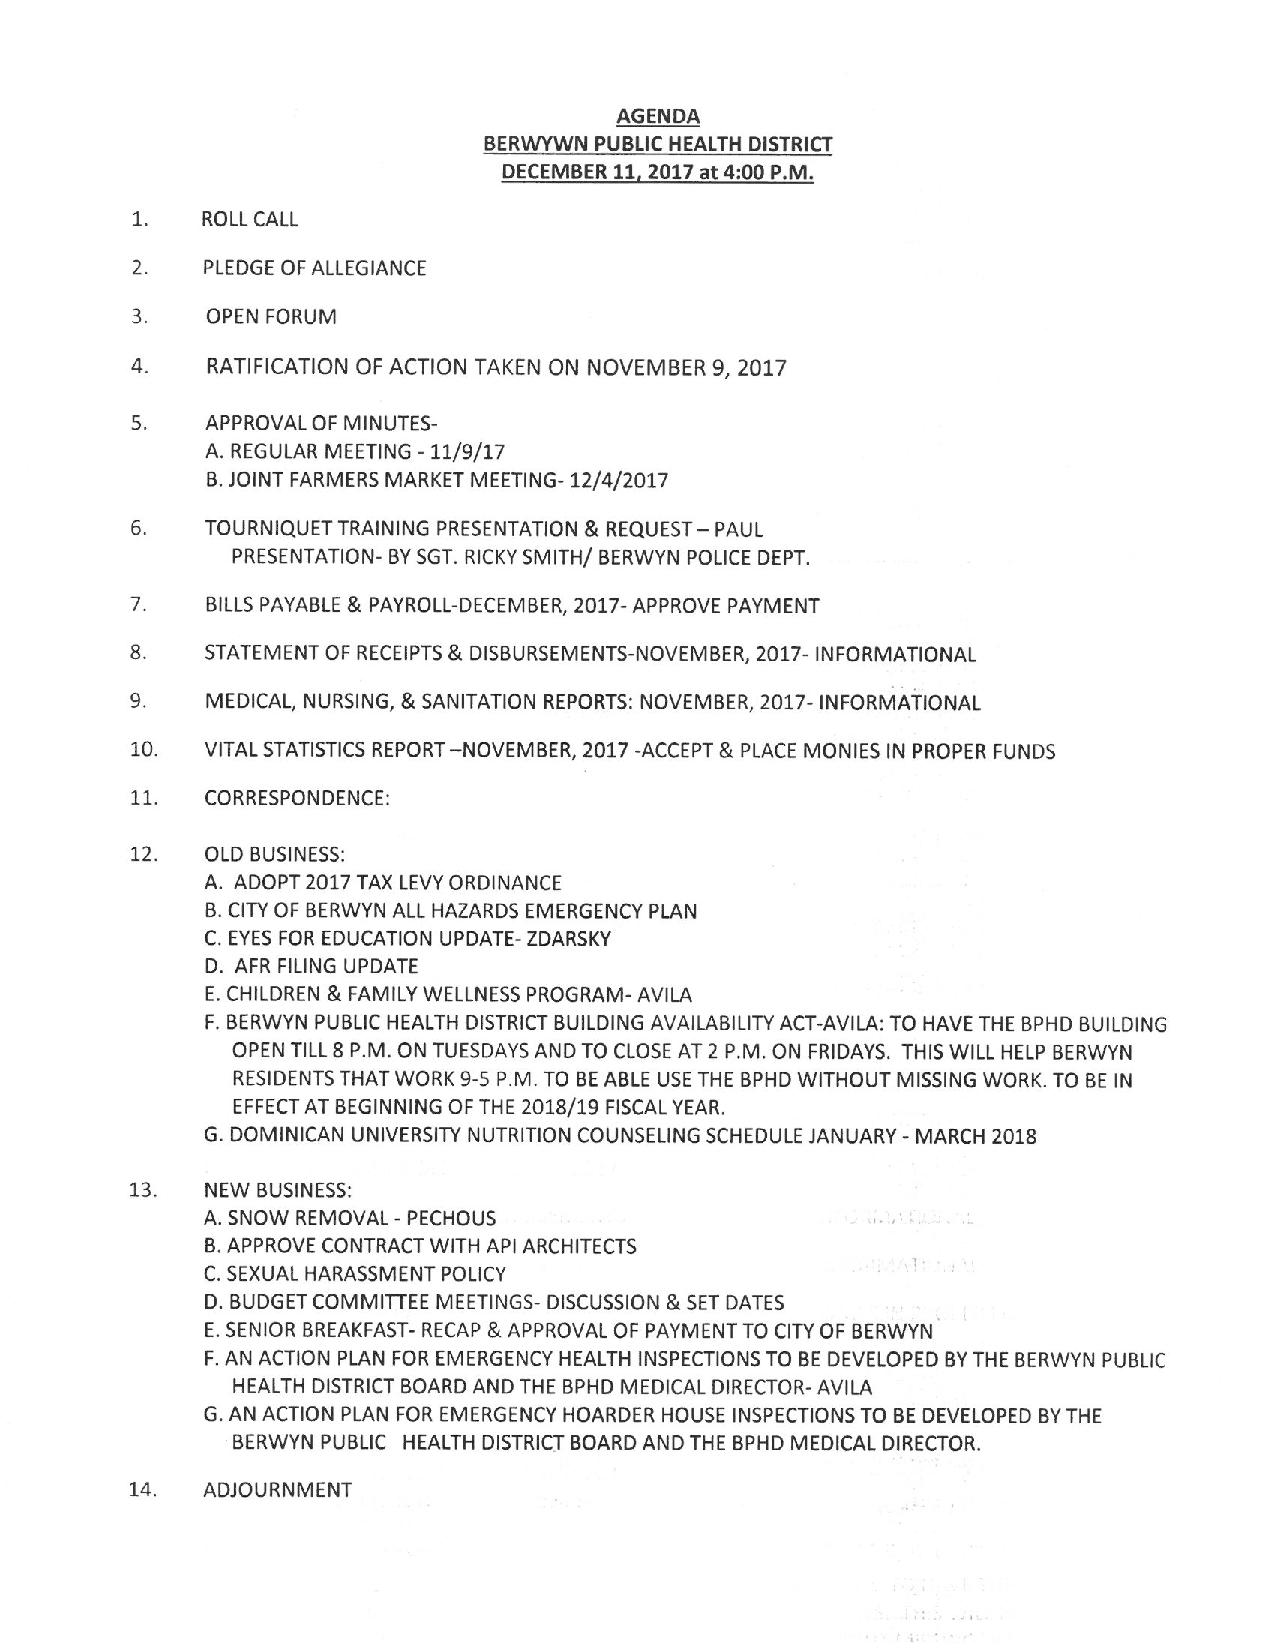 HD_Agenda_12.11.2017-page-001.jpg